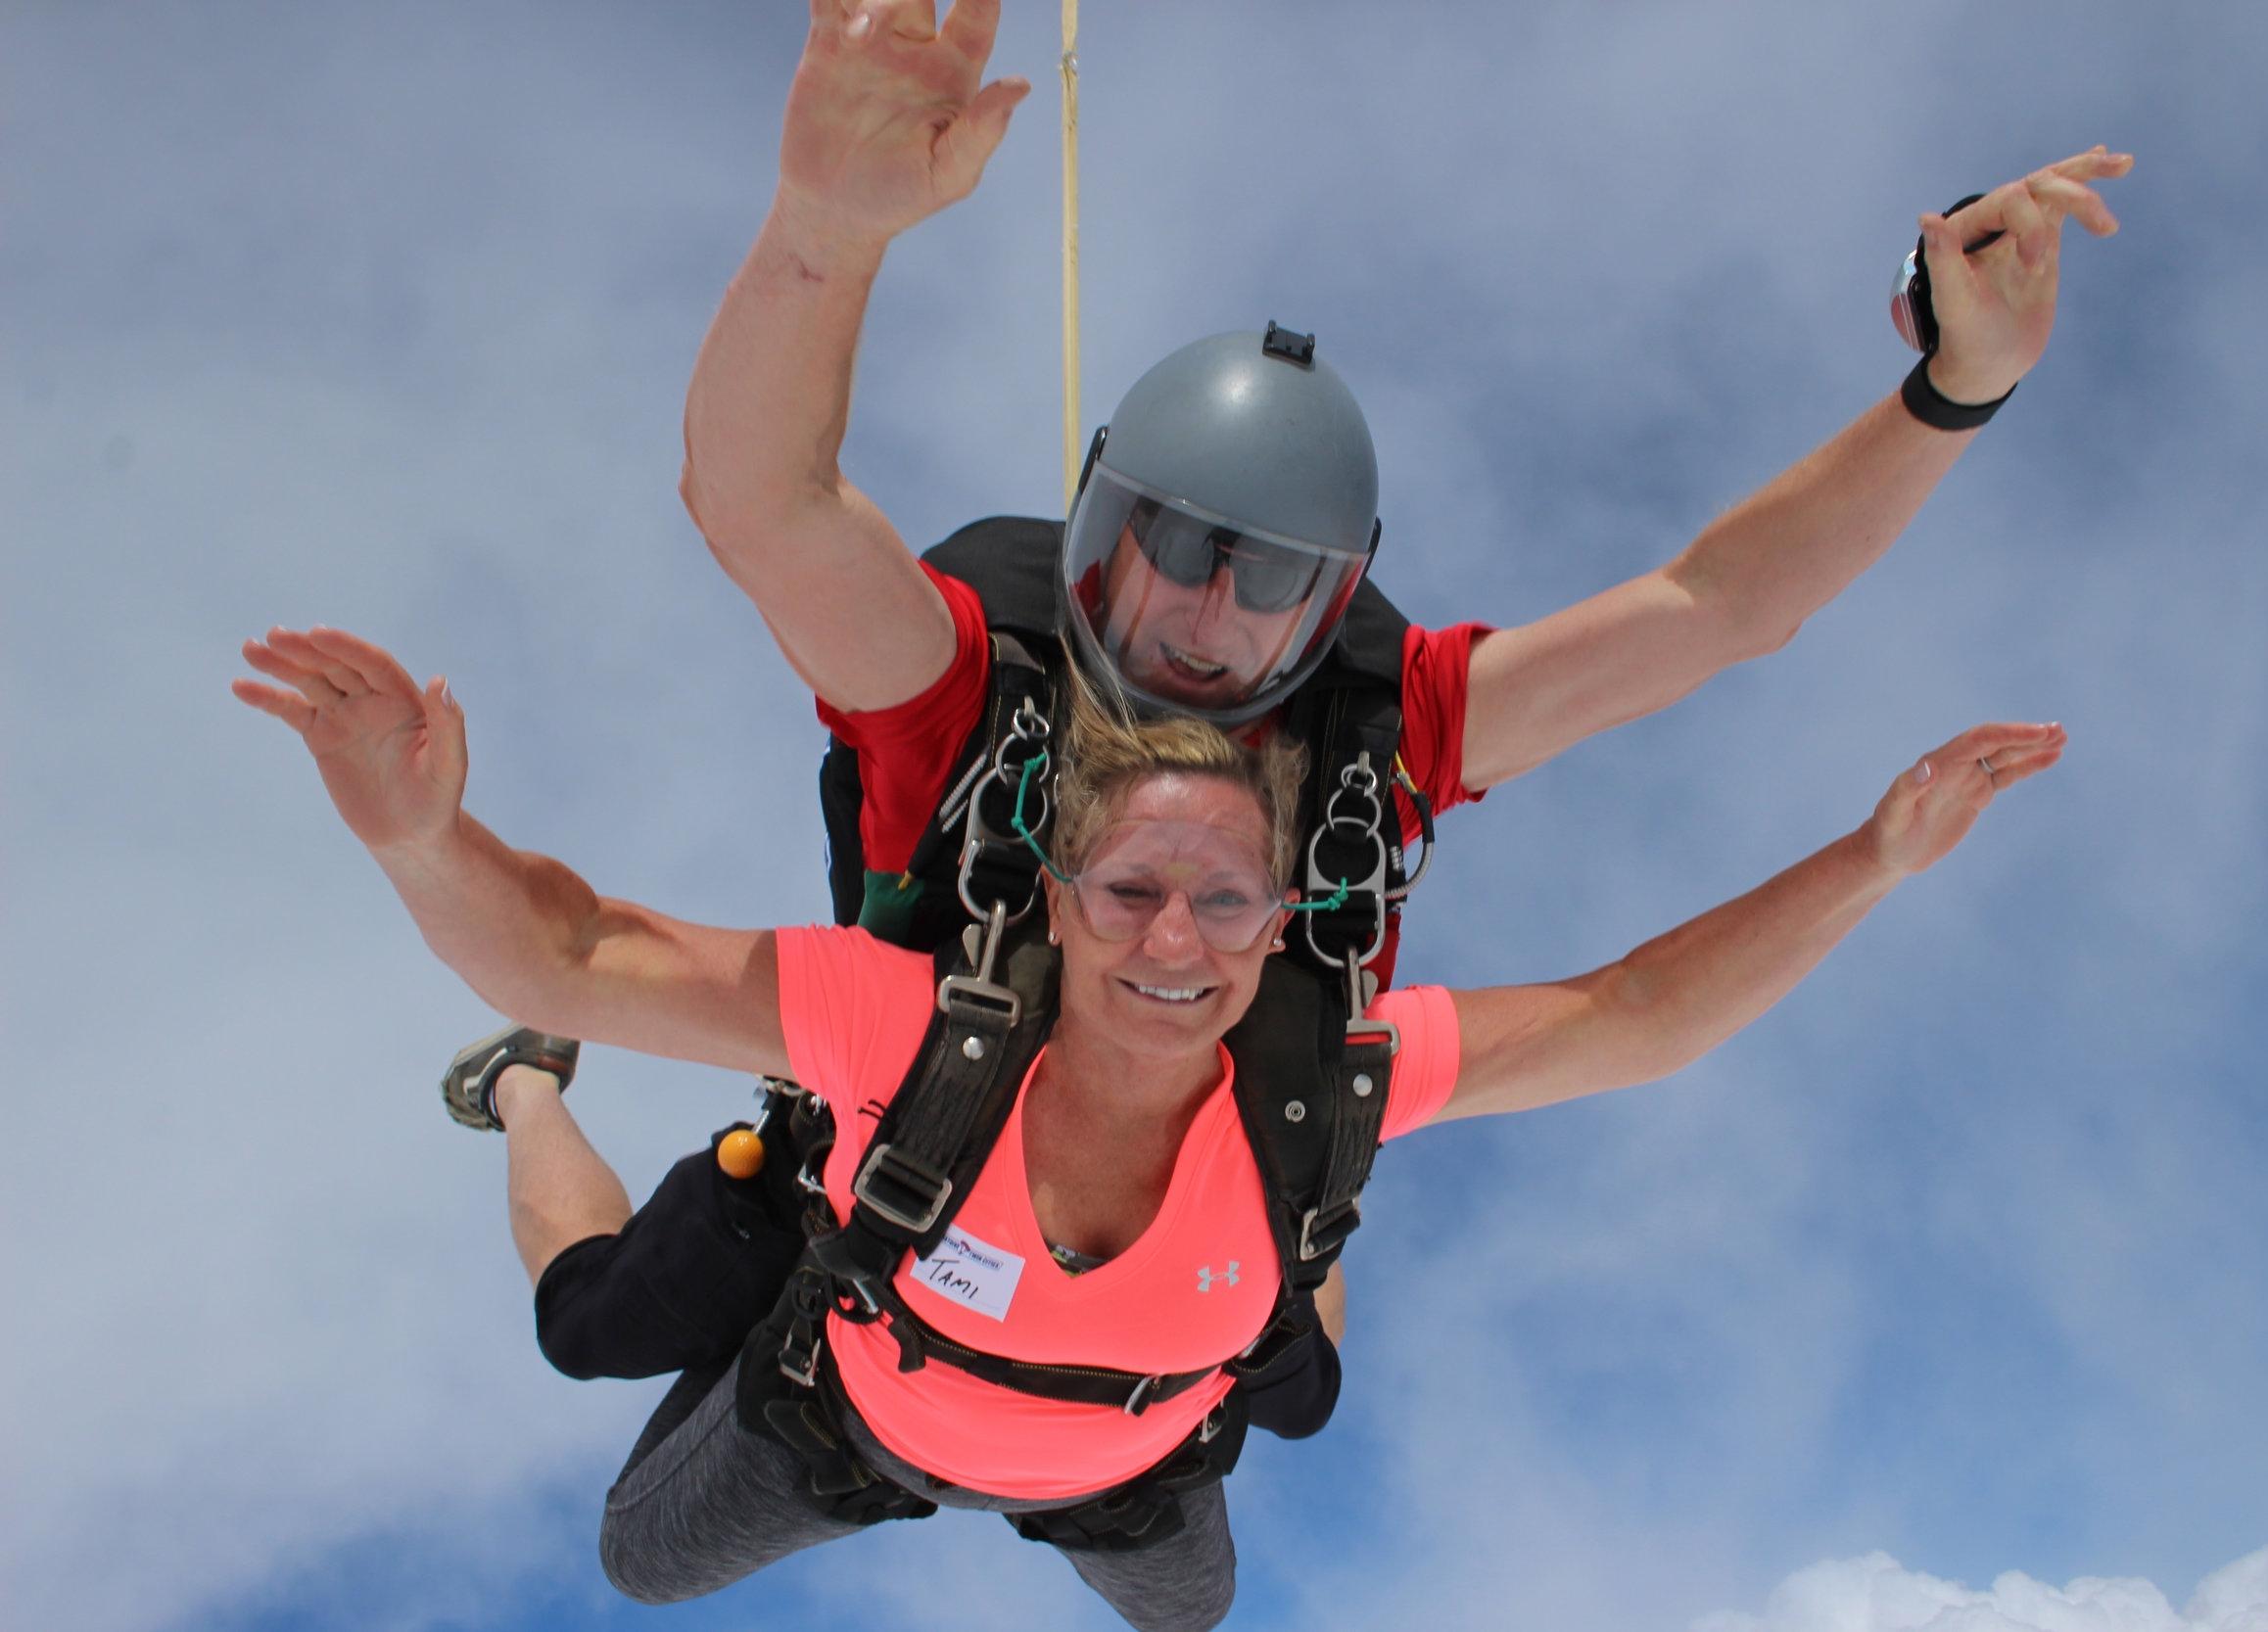 Tami Holsten skydiving photo.jpg